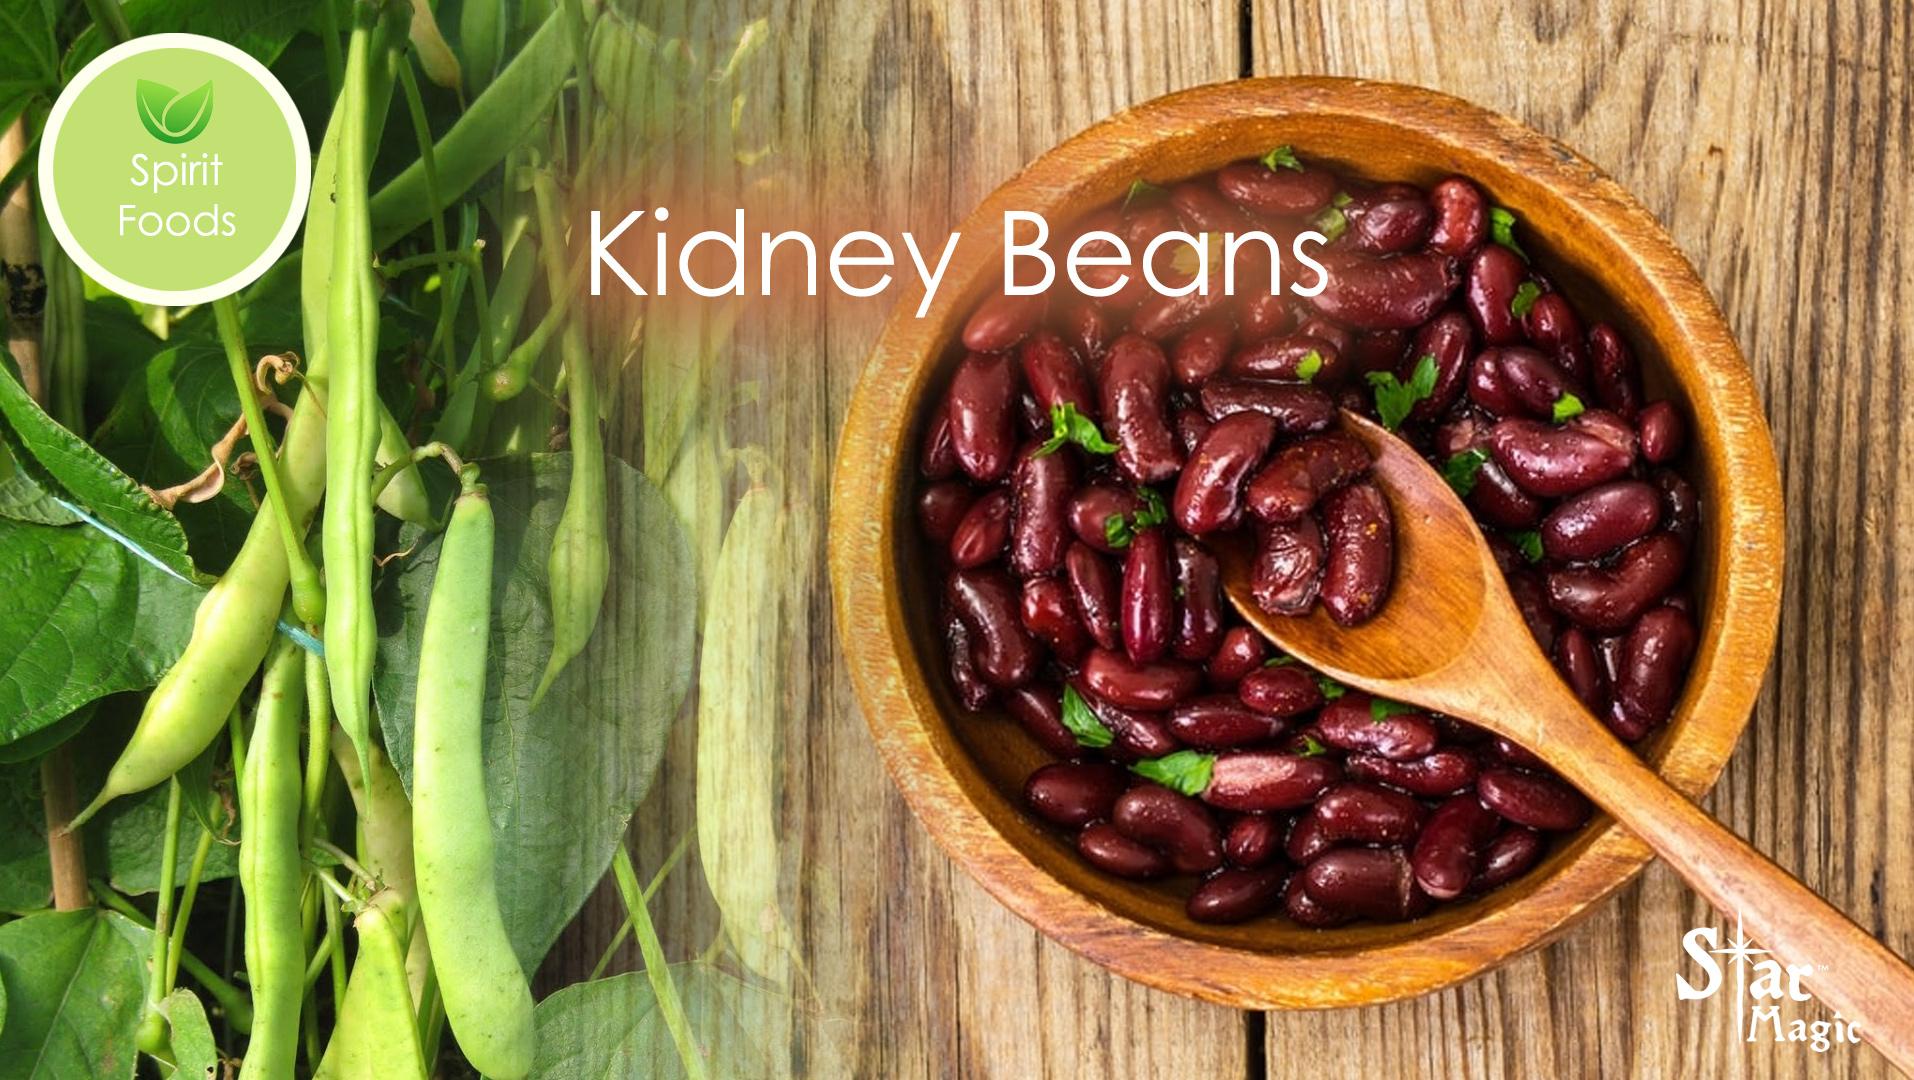 Spirit Food Kidney Beans